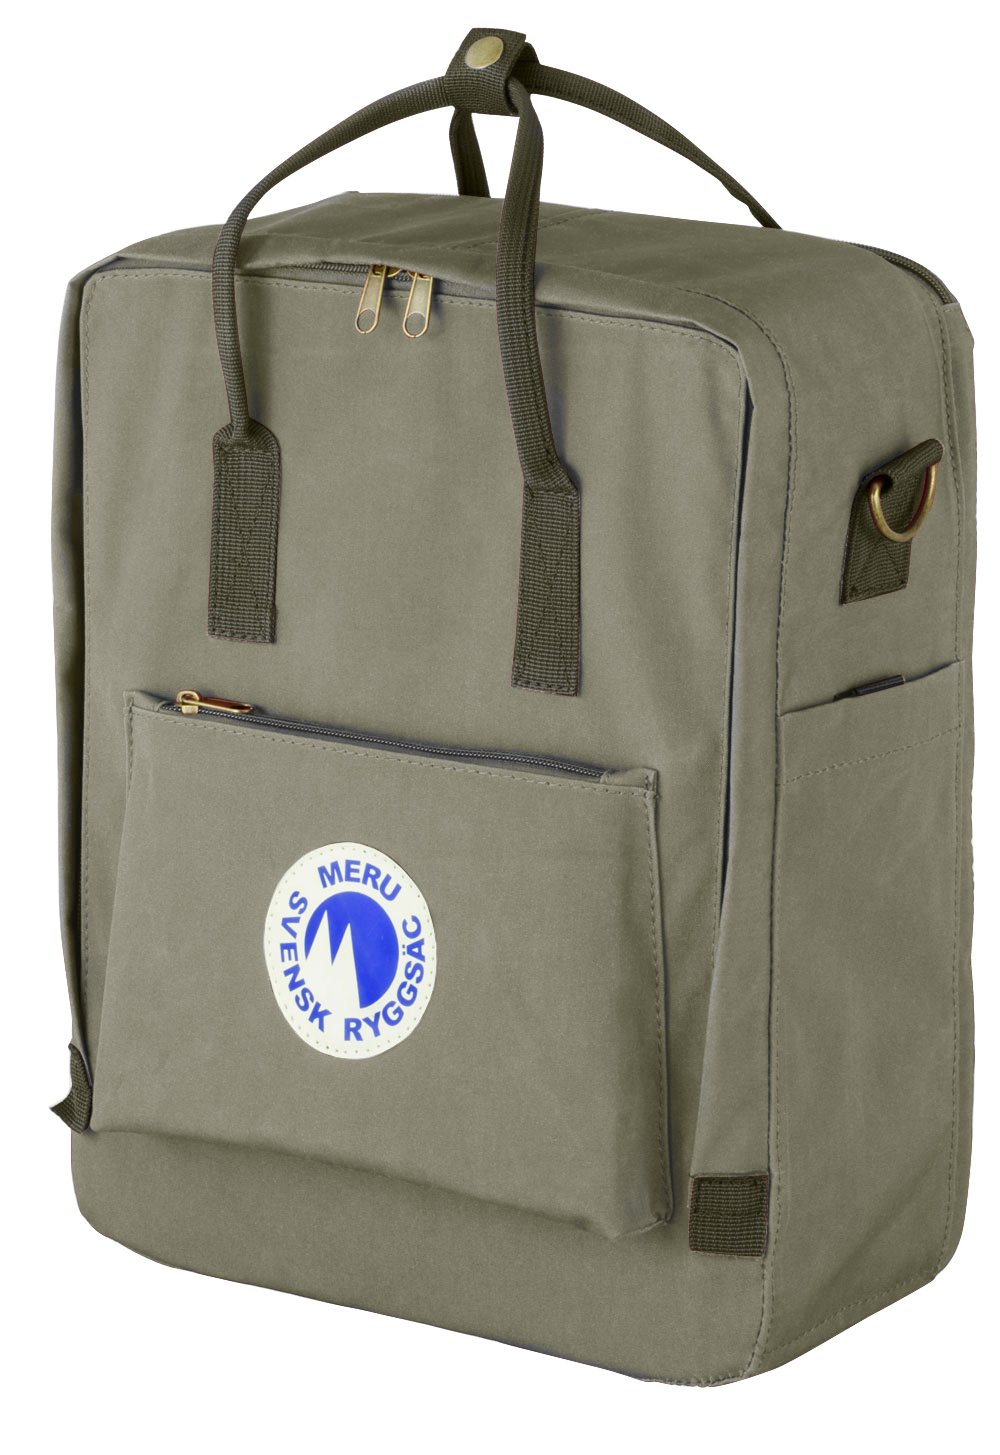 bf12692a6944 Amazon.com  Meru Swedish Backpack (Svensk Ryggsac) Small Daypack Waterproof  School Bag Pack - Unisex (Gray)  Sports   Outdoors